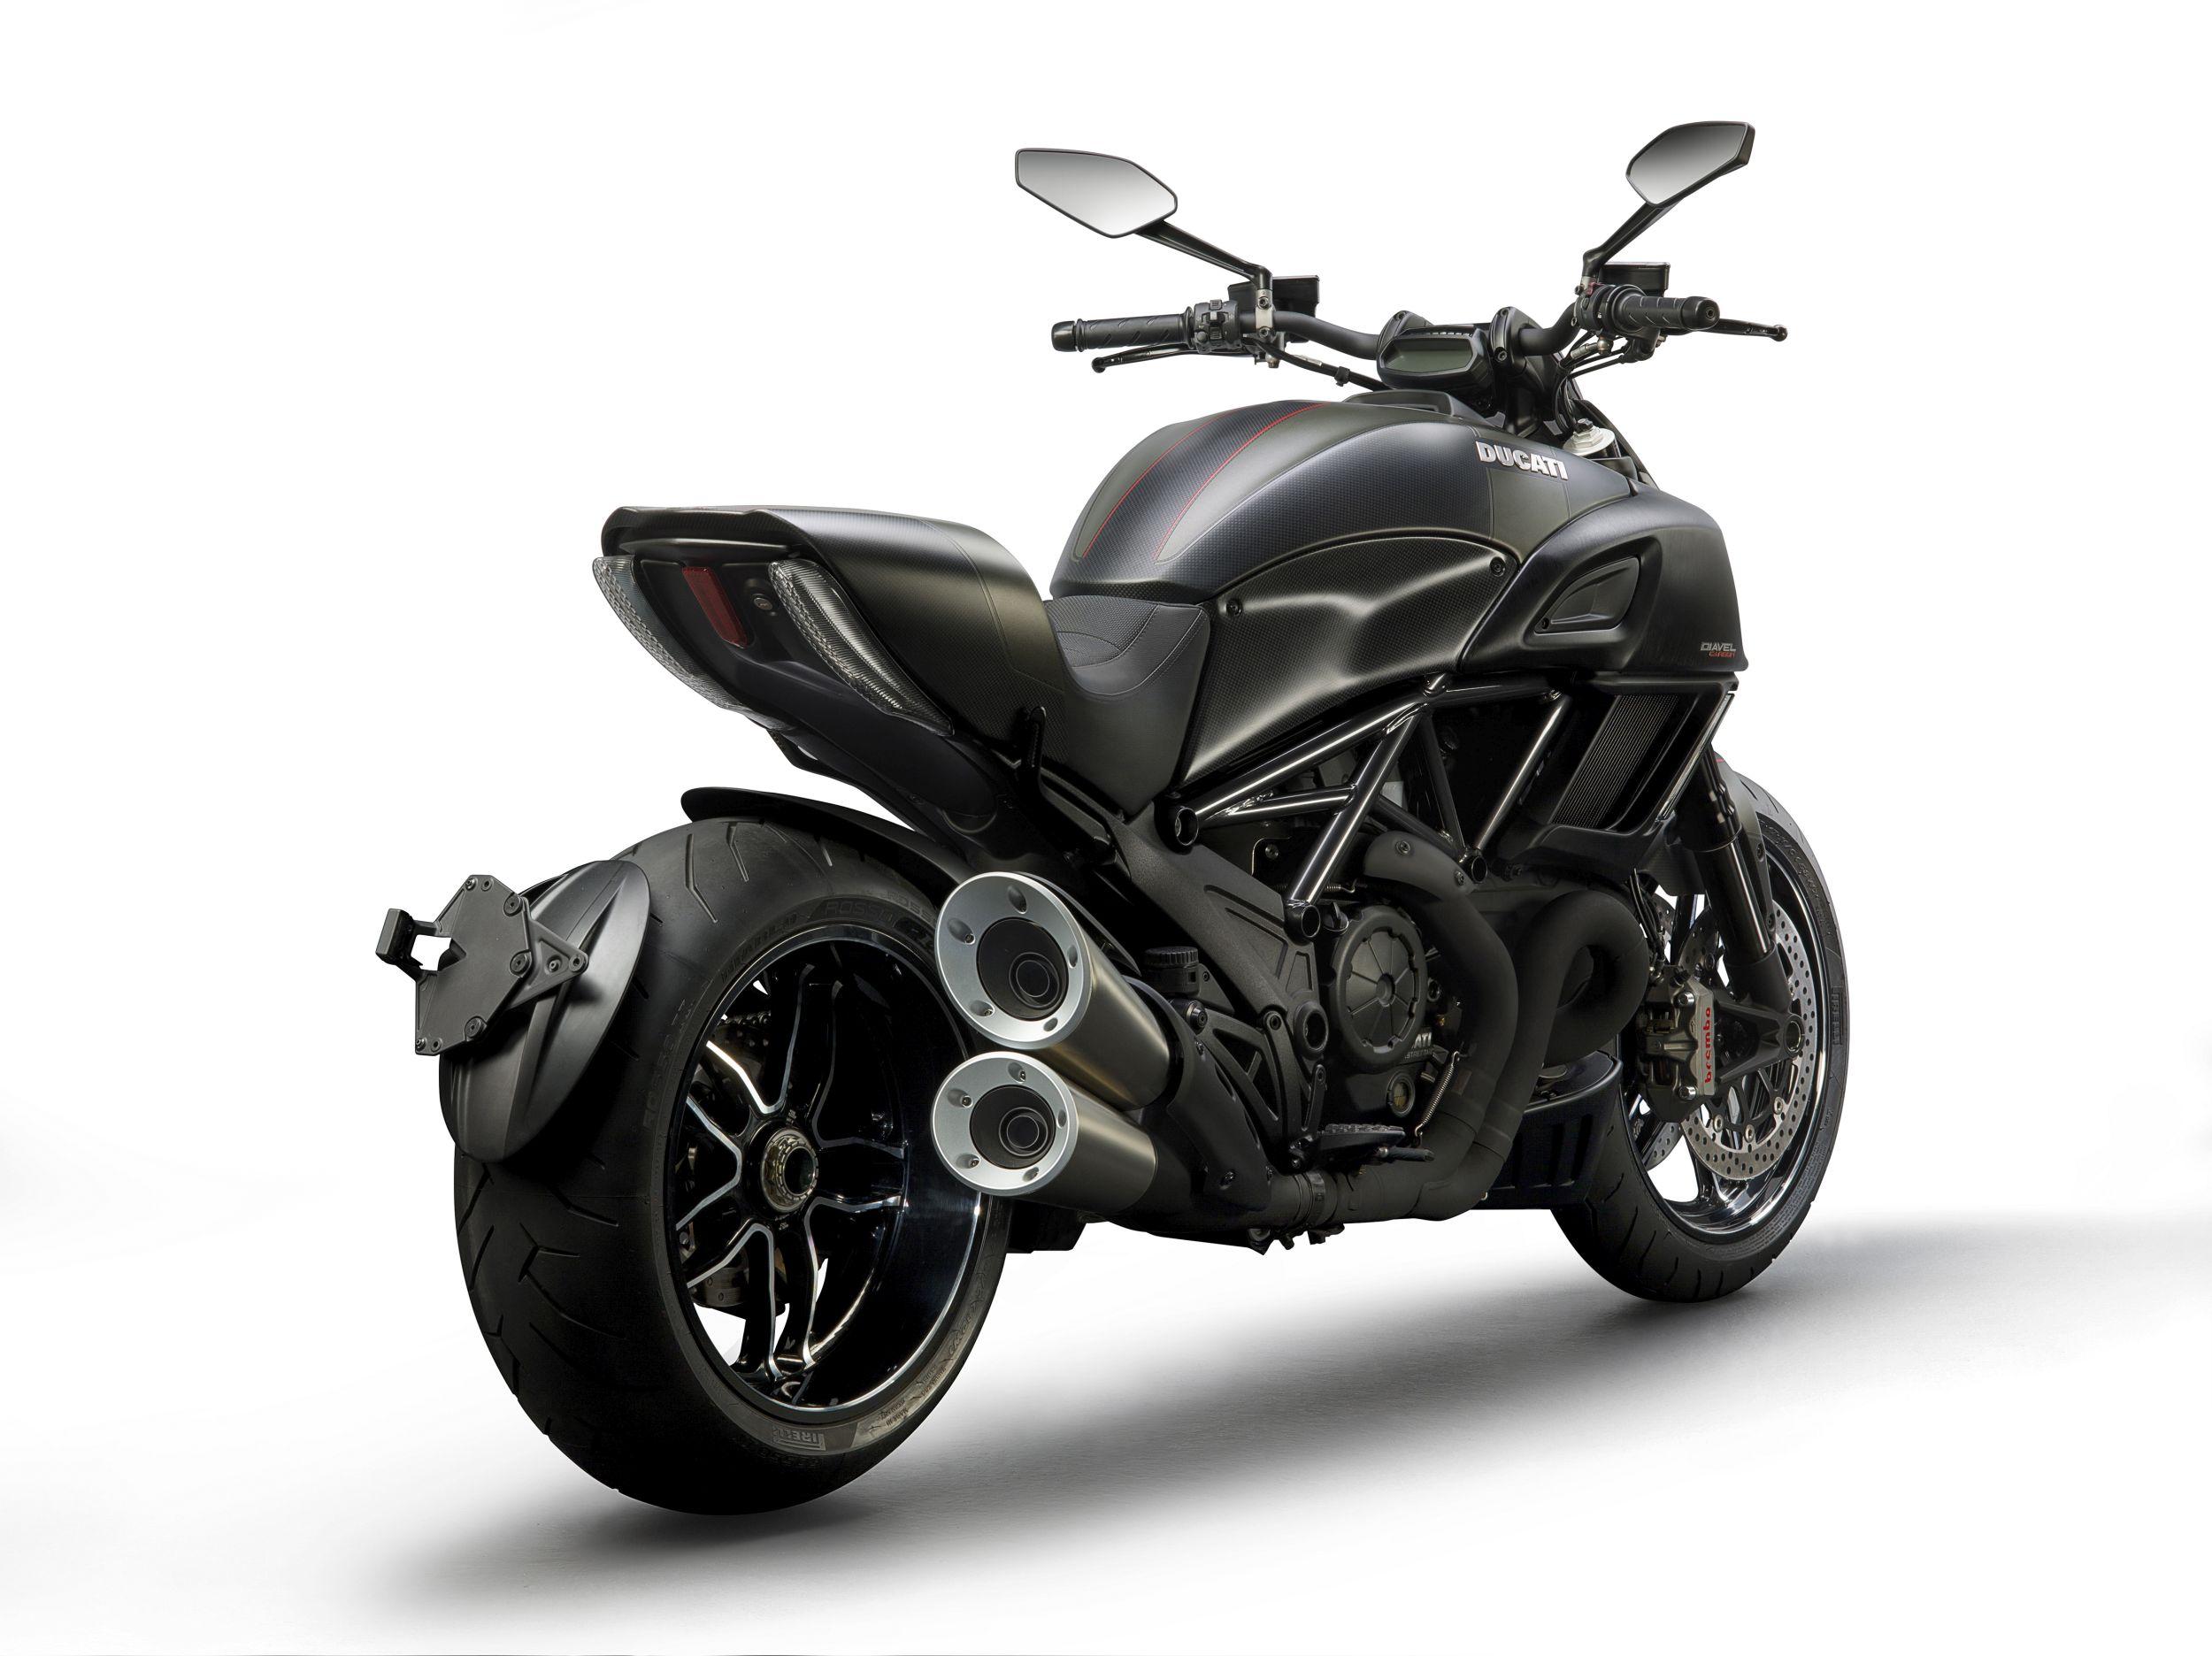 Ducati Multistrarda Dark Edition